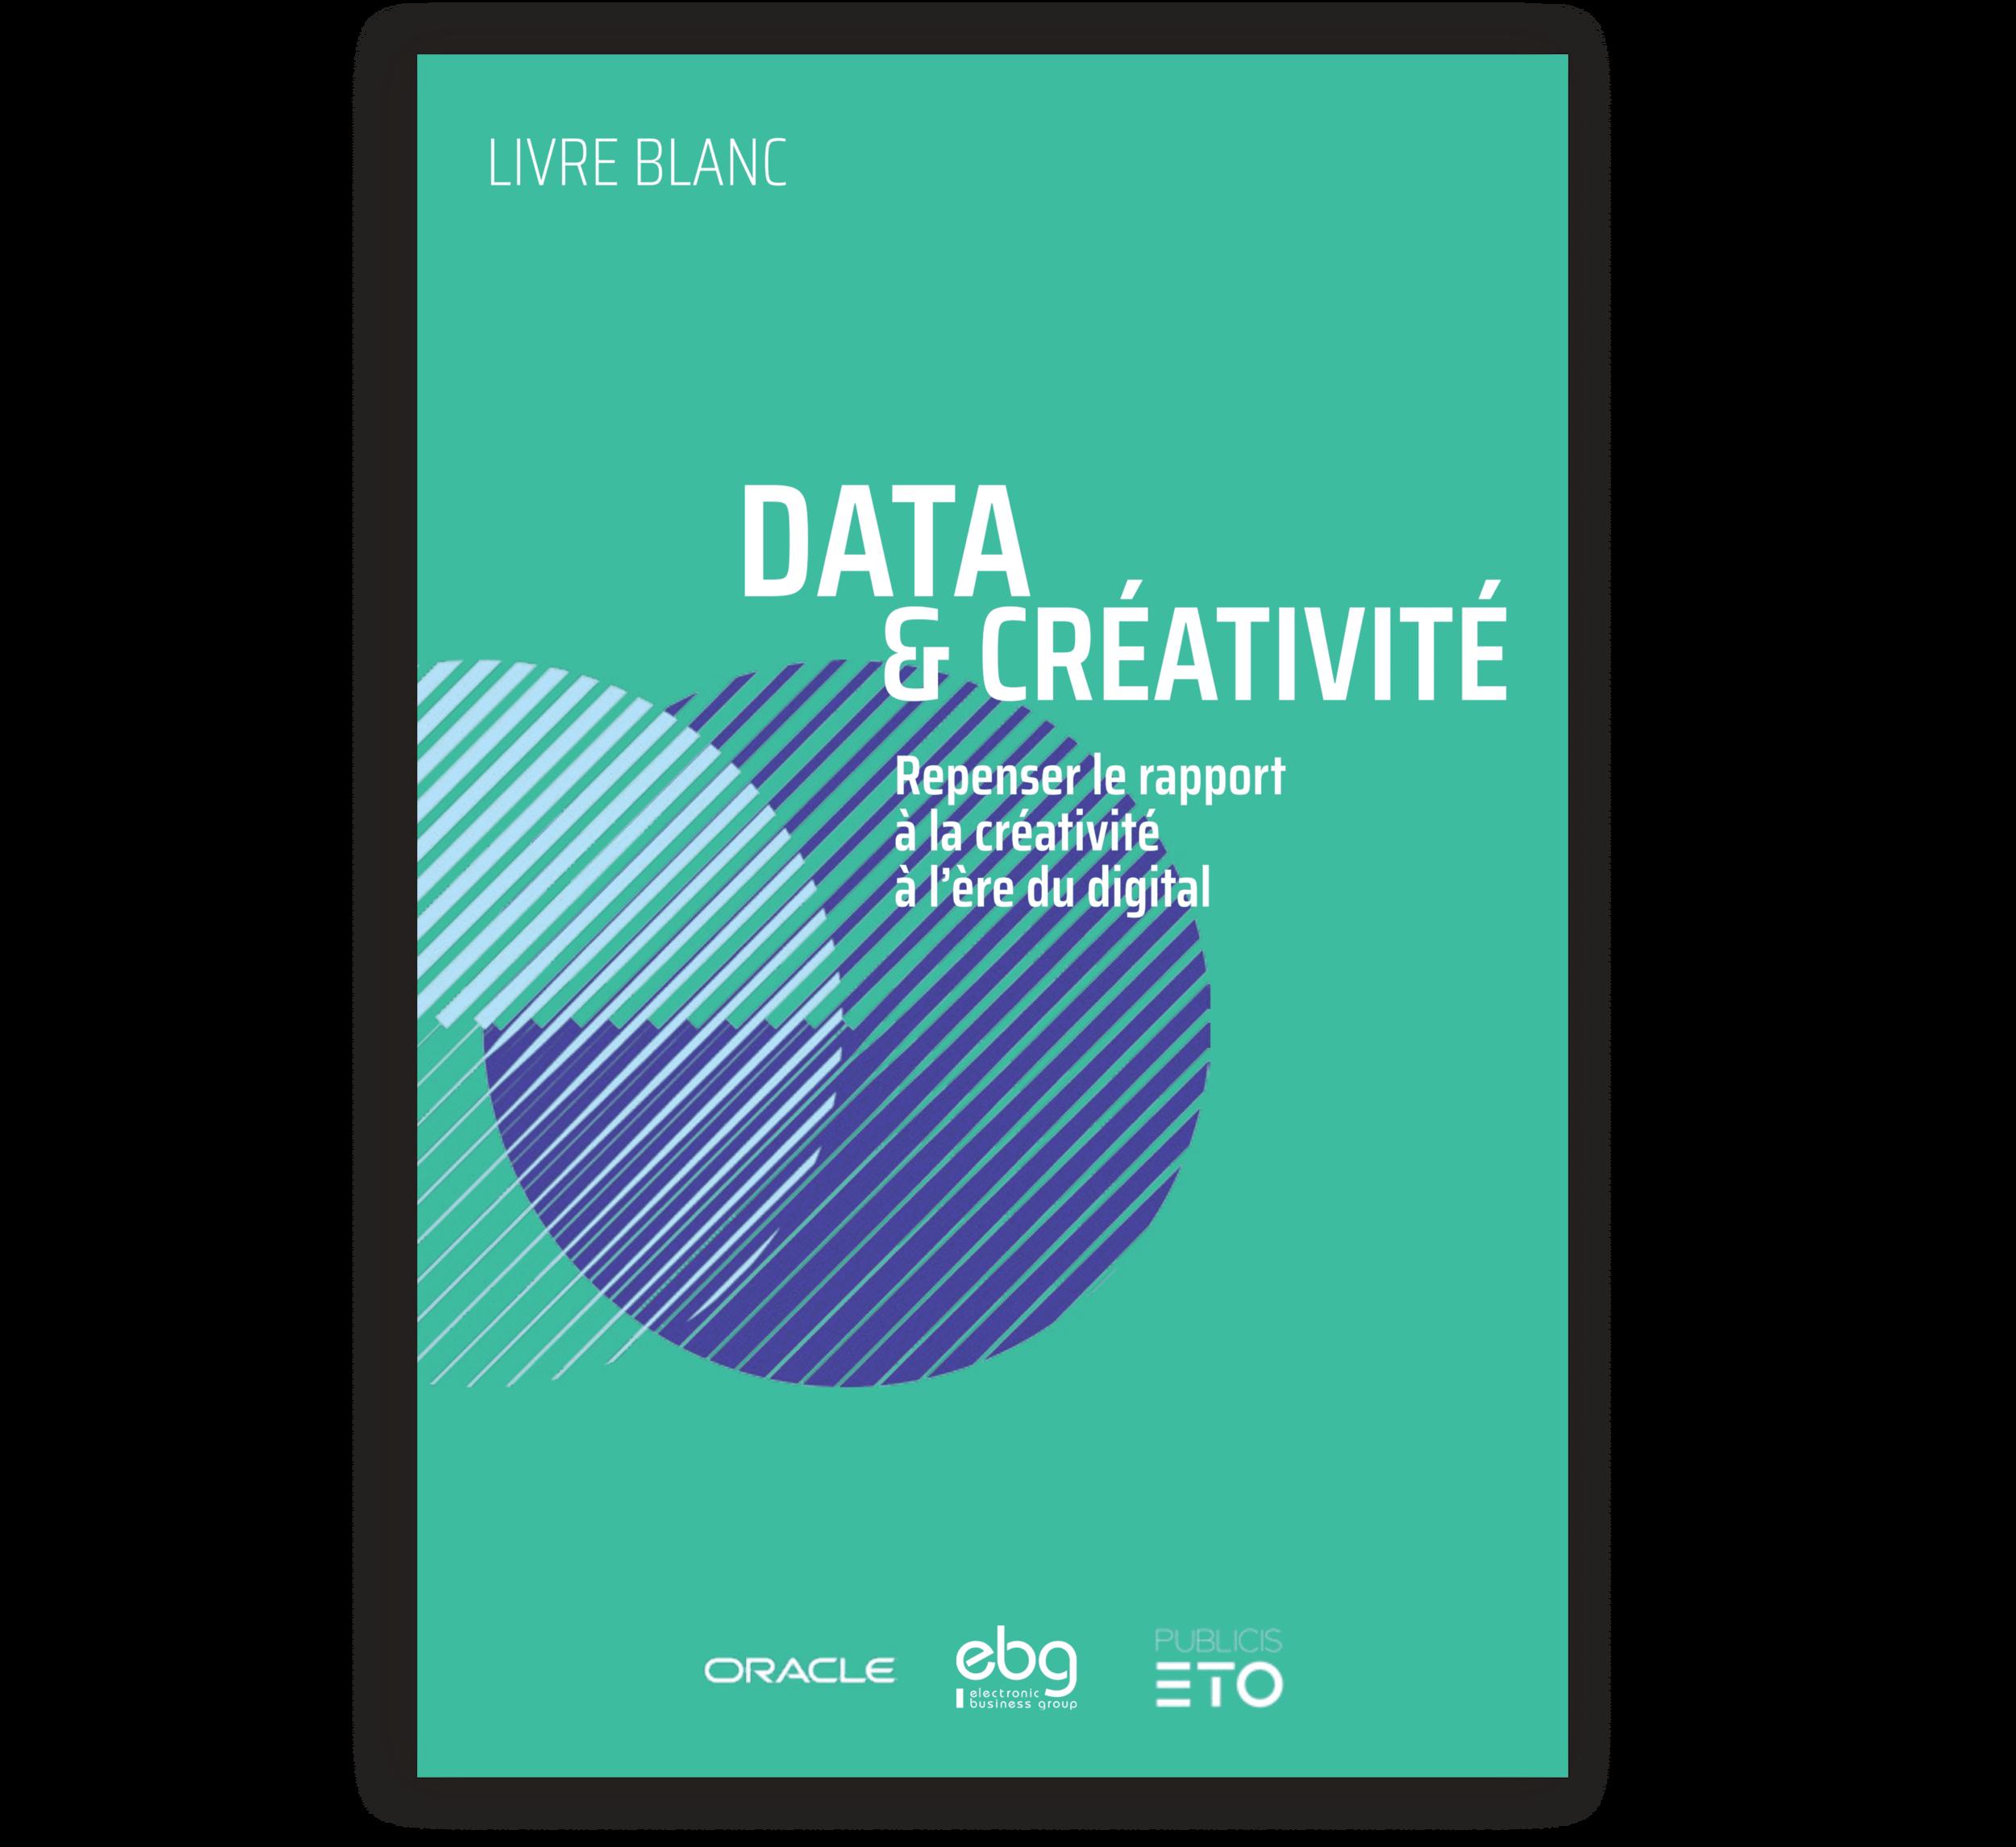 Livre_Blanc_Data&Creativite-2.png